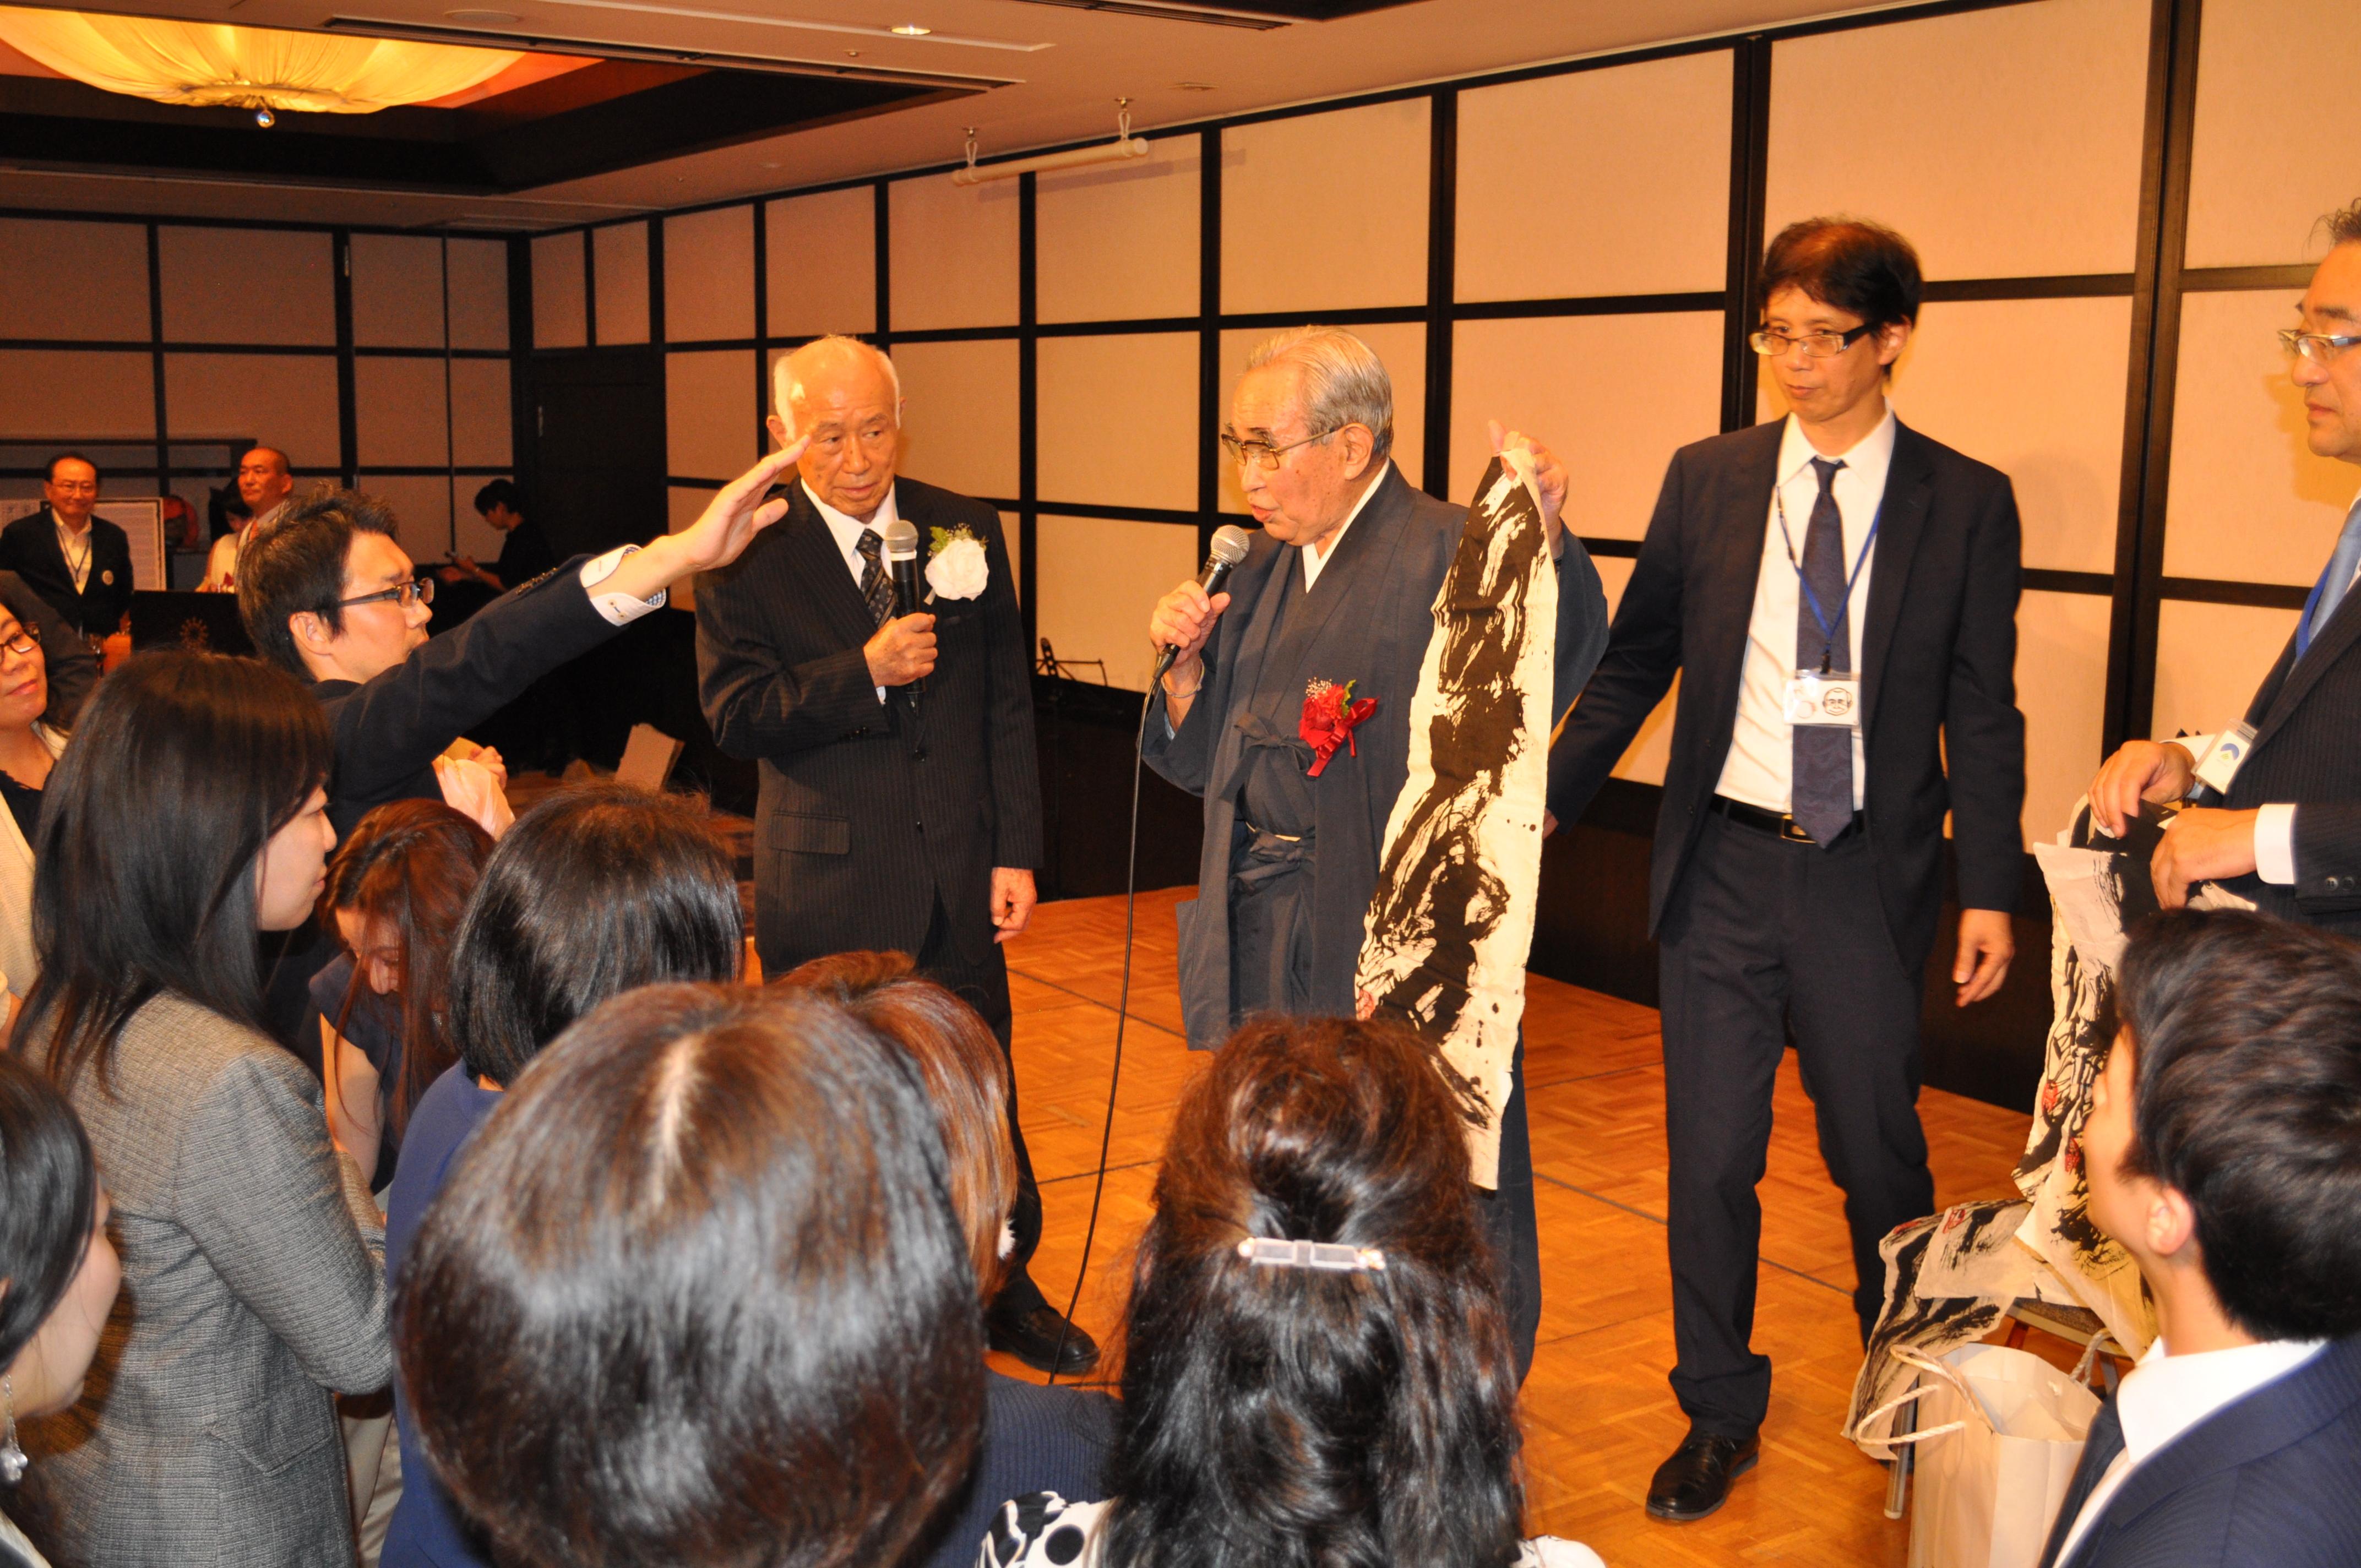 DSC 0574 - 第6回思風会全国大会2018in東京開催